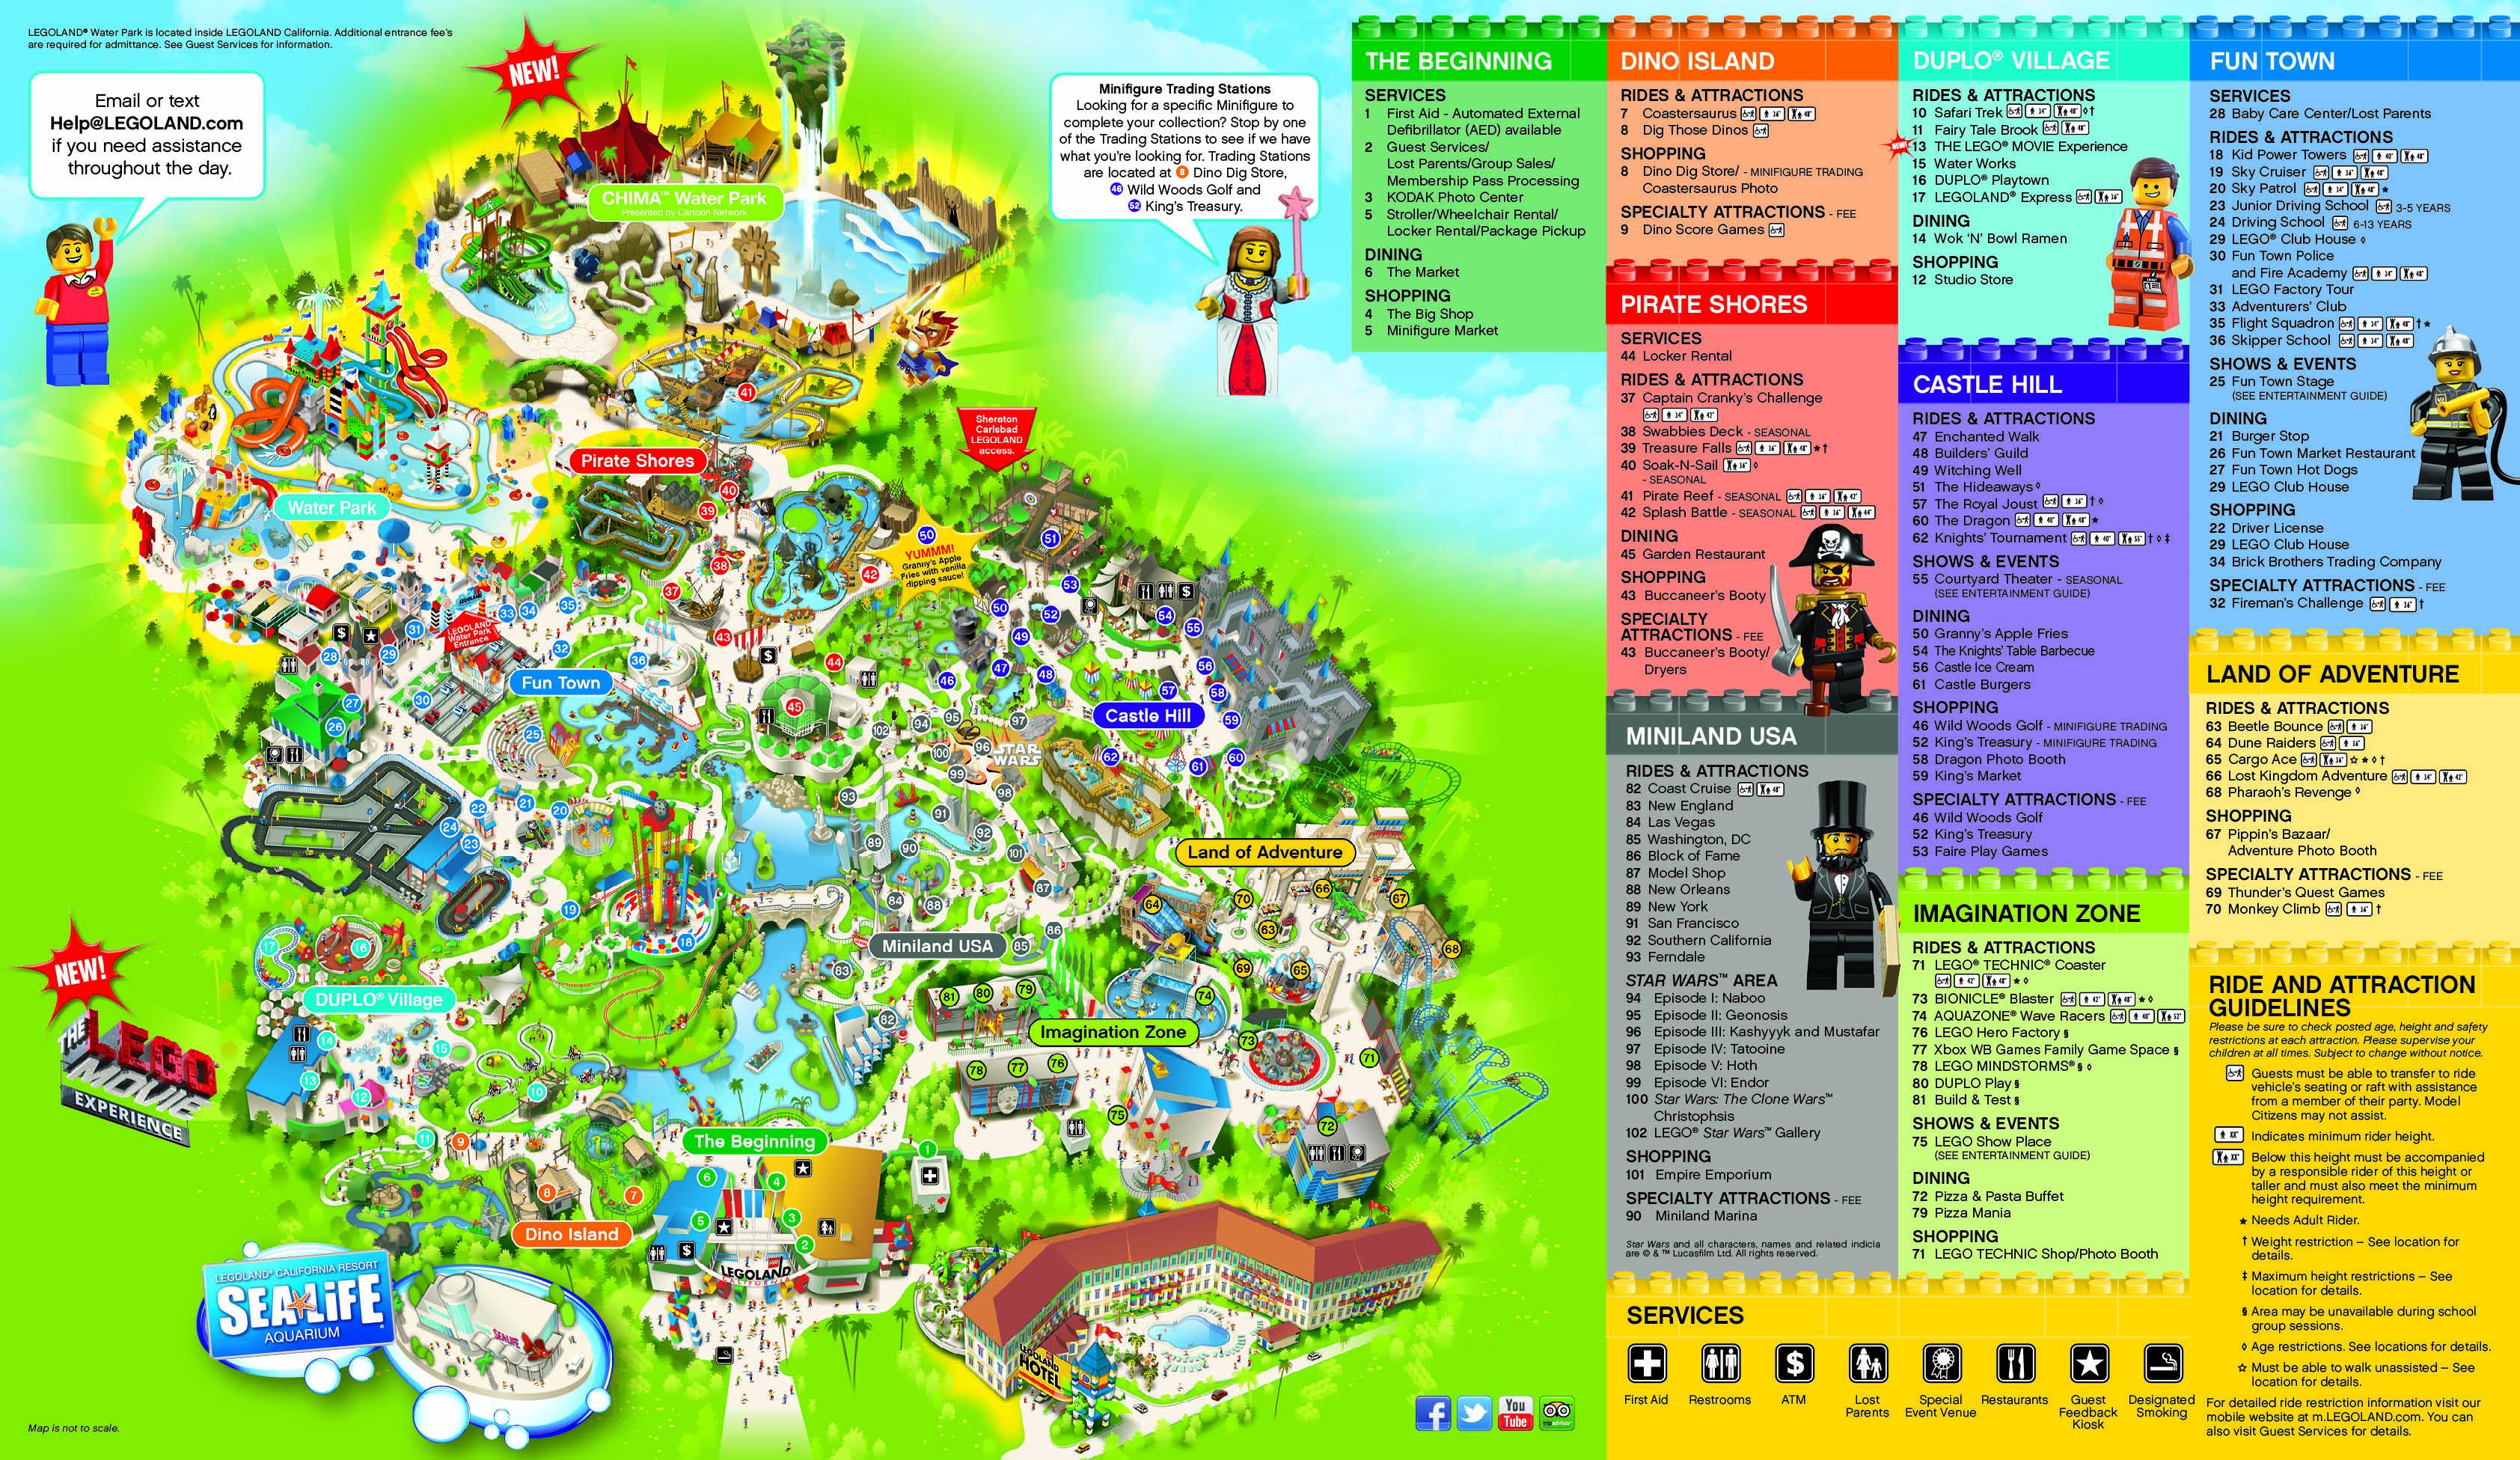 Legoland California Park Map - Klipy - Legoland California Water Park Map